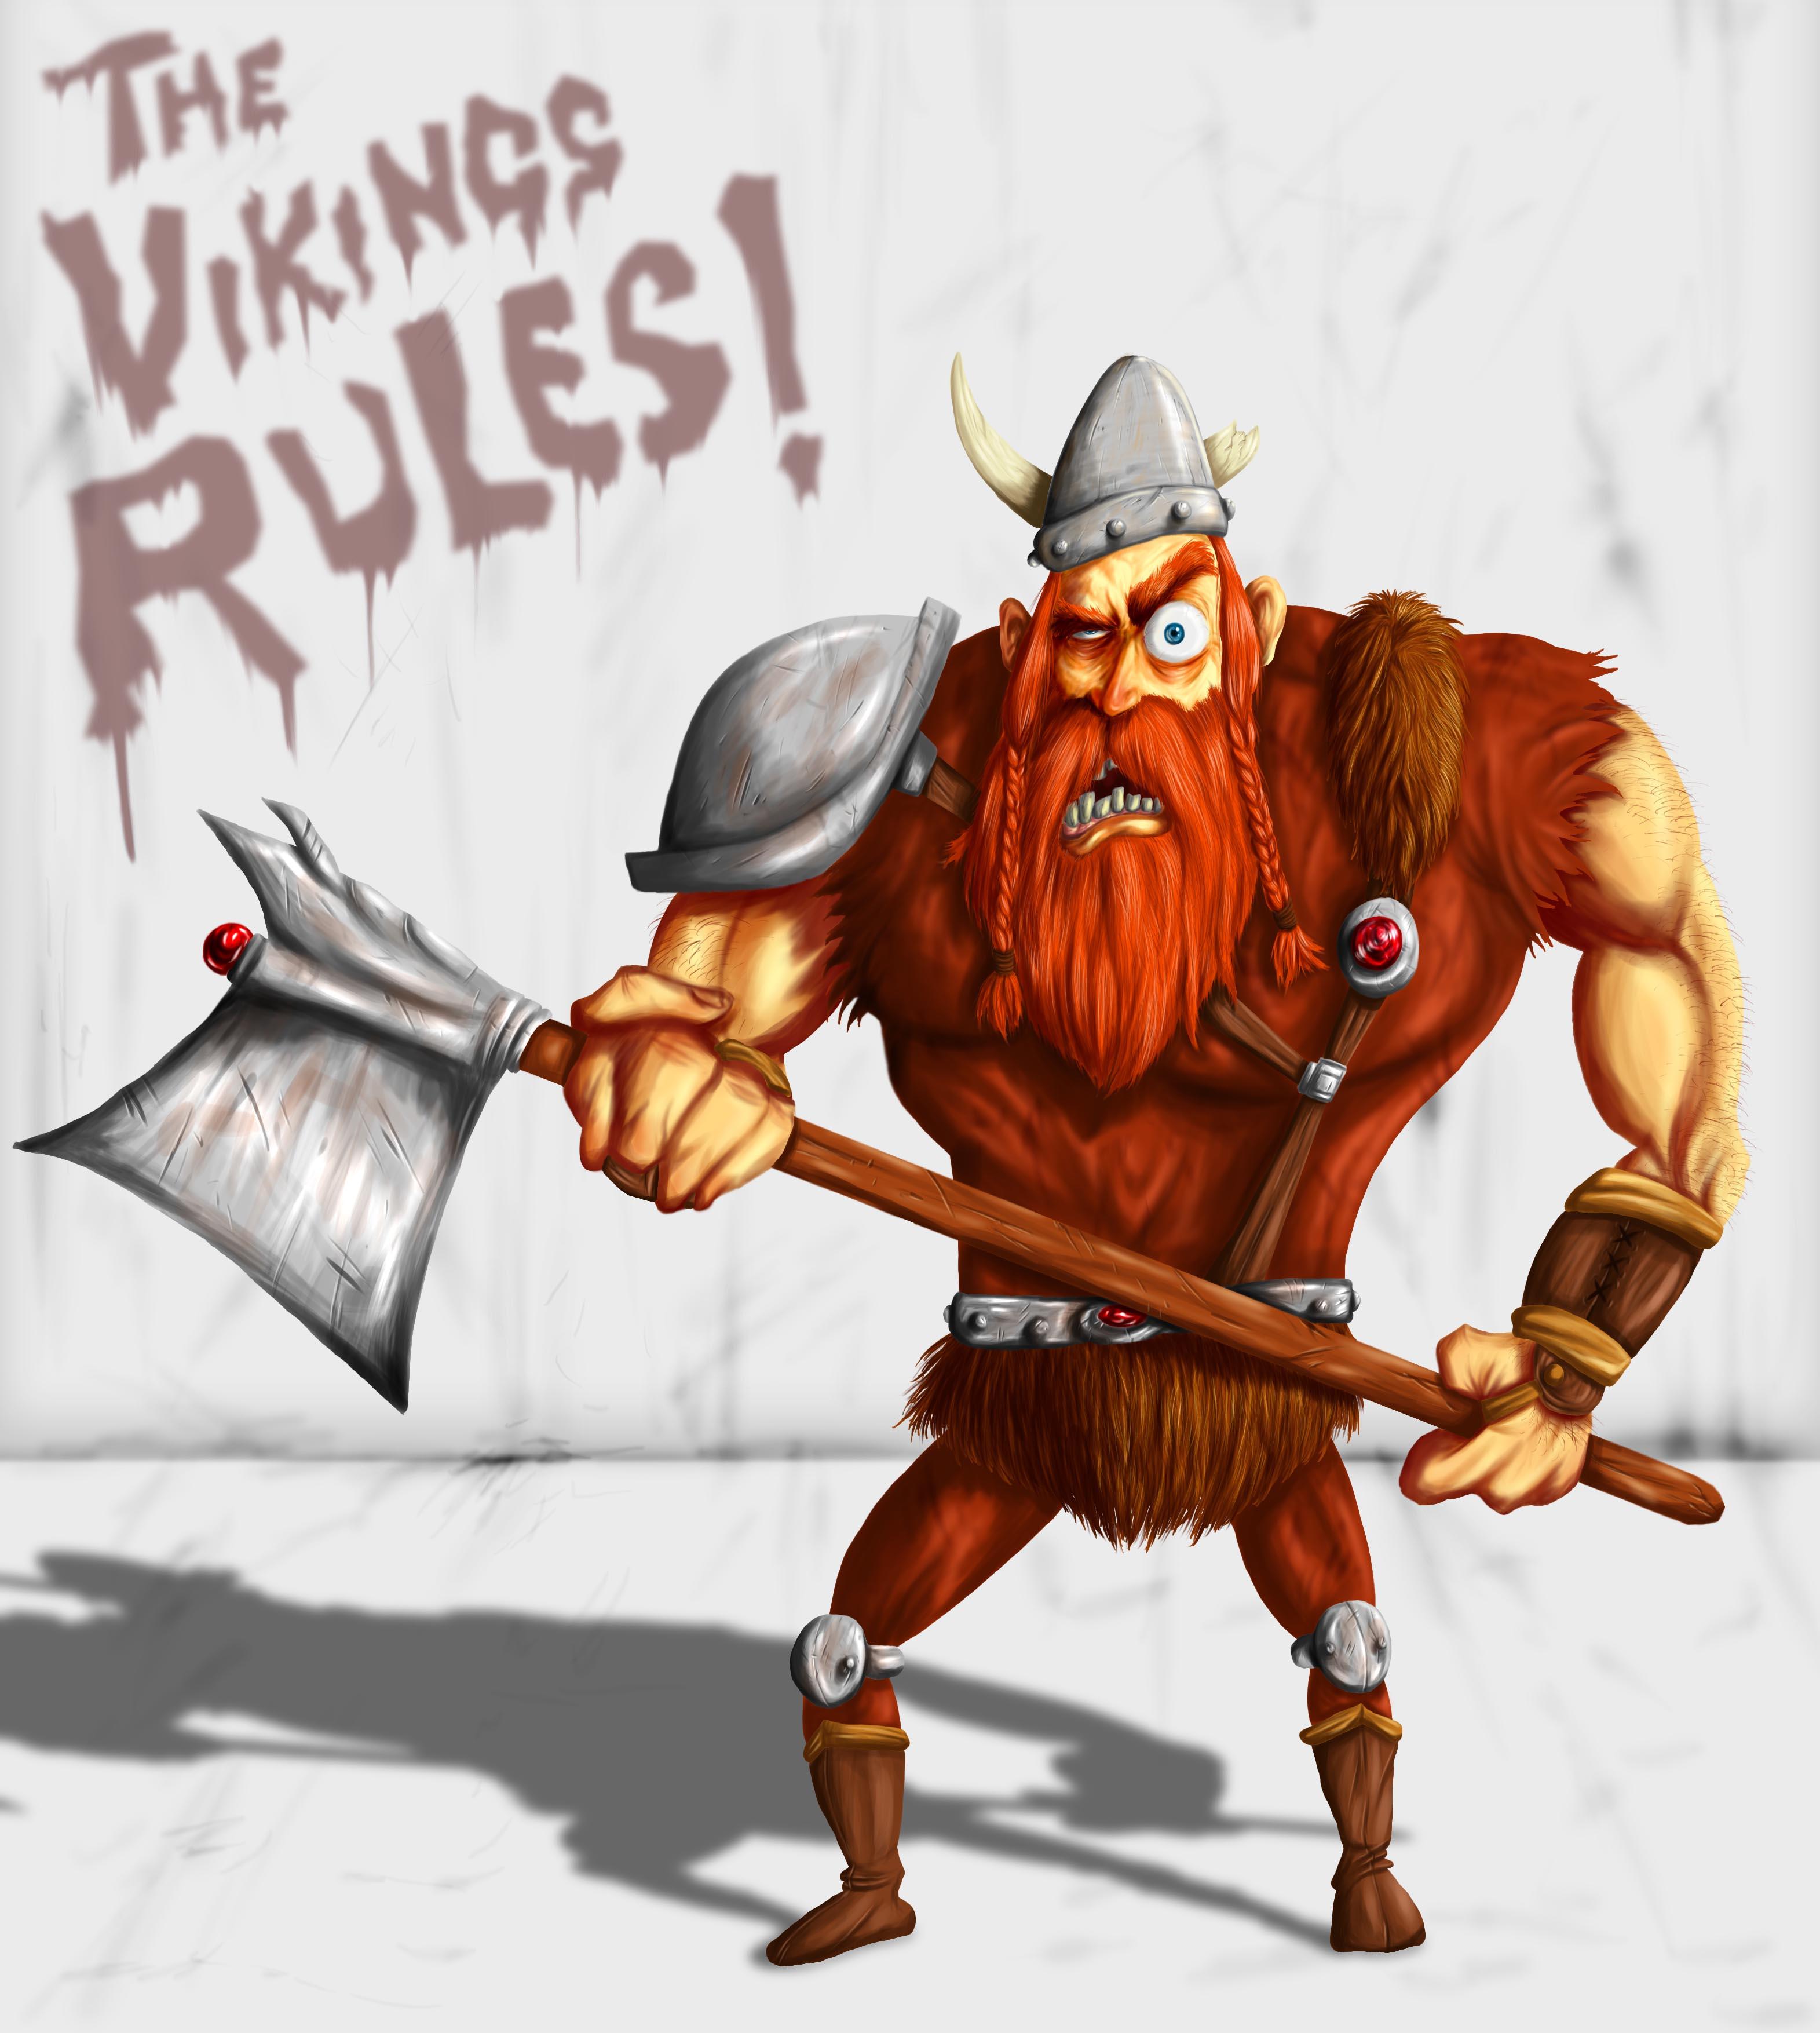 Спортивного праздника, викинги веселые картинки